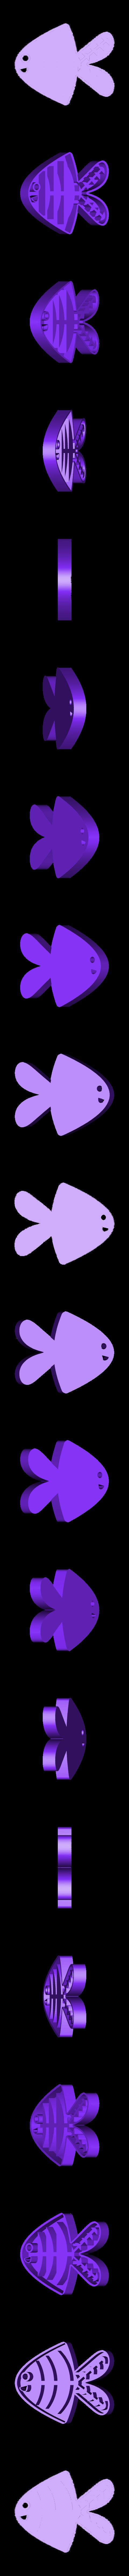 fish_half.stl Download free STL file Tide the Fish • Design to 3D print, Tarnliare